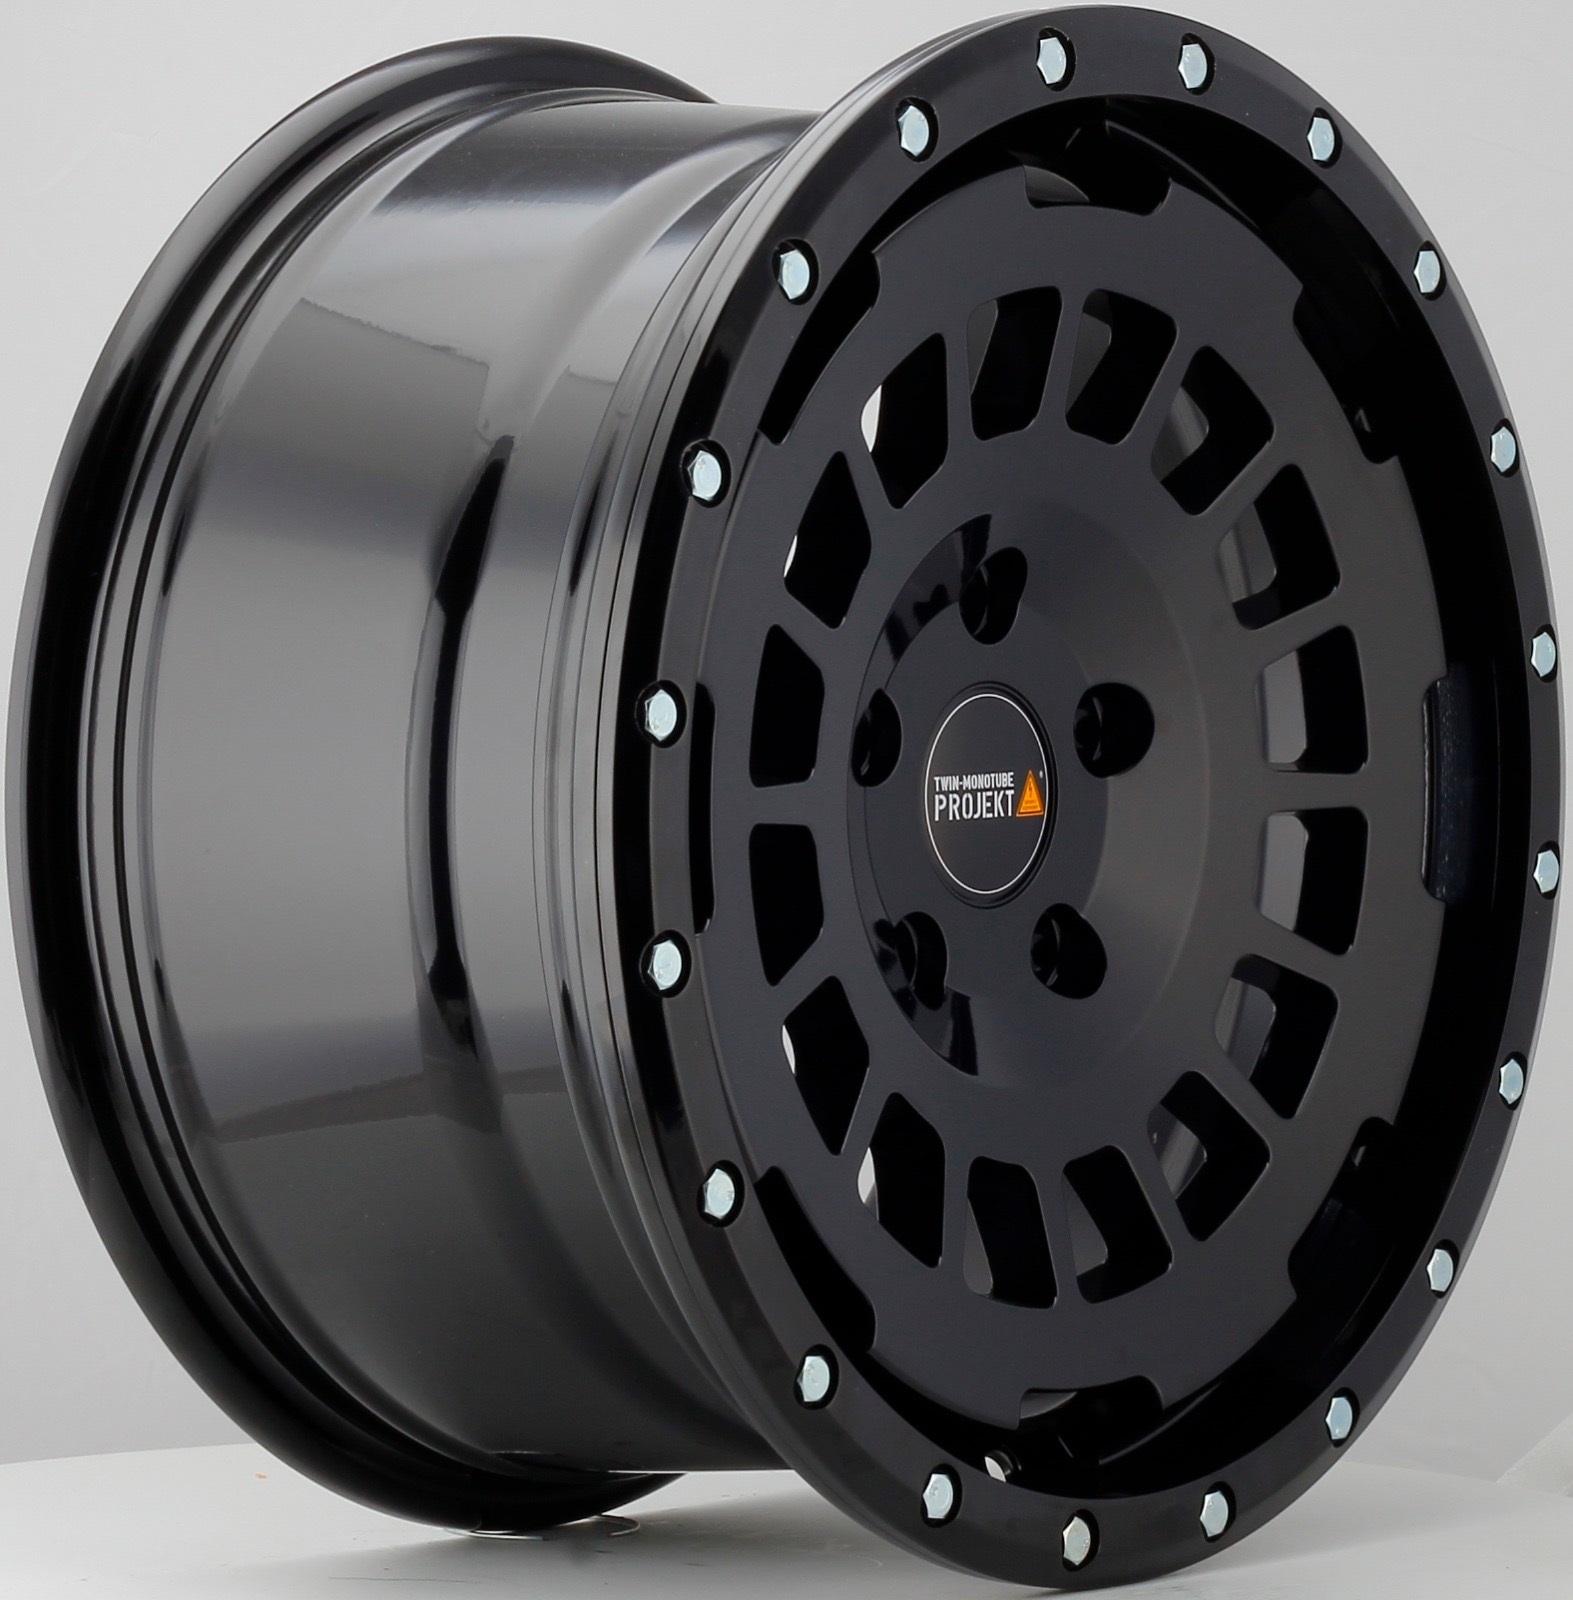 4x Allterrain Felge 8x17 schwarz matt für VW T6.1 Twin Monotube Proje